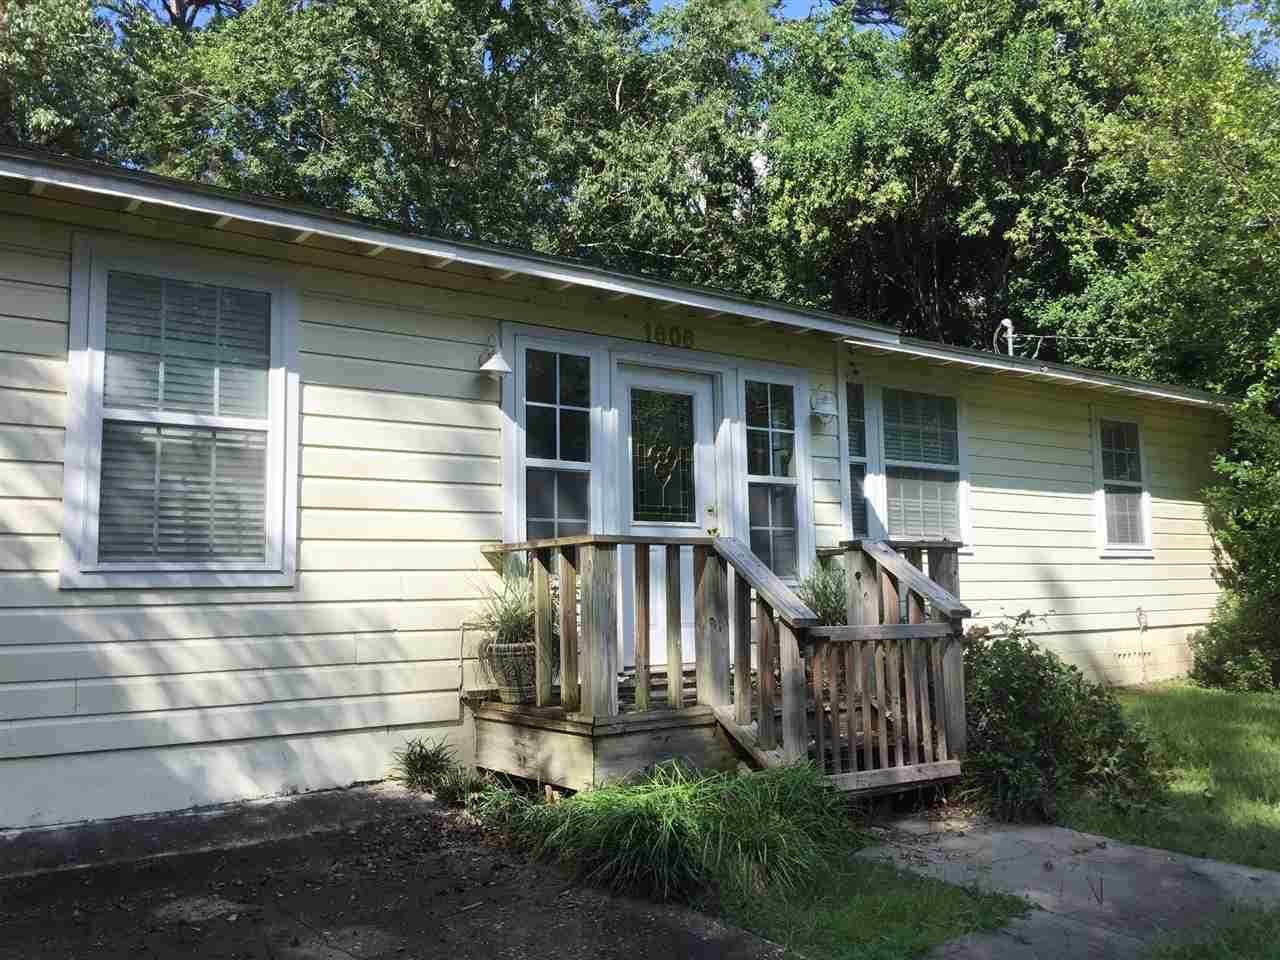 1606 Kolopakin Nene Tallahassee, FL 32301 in Indian Head Acres Photo 1